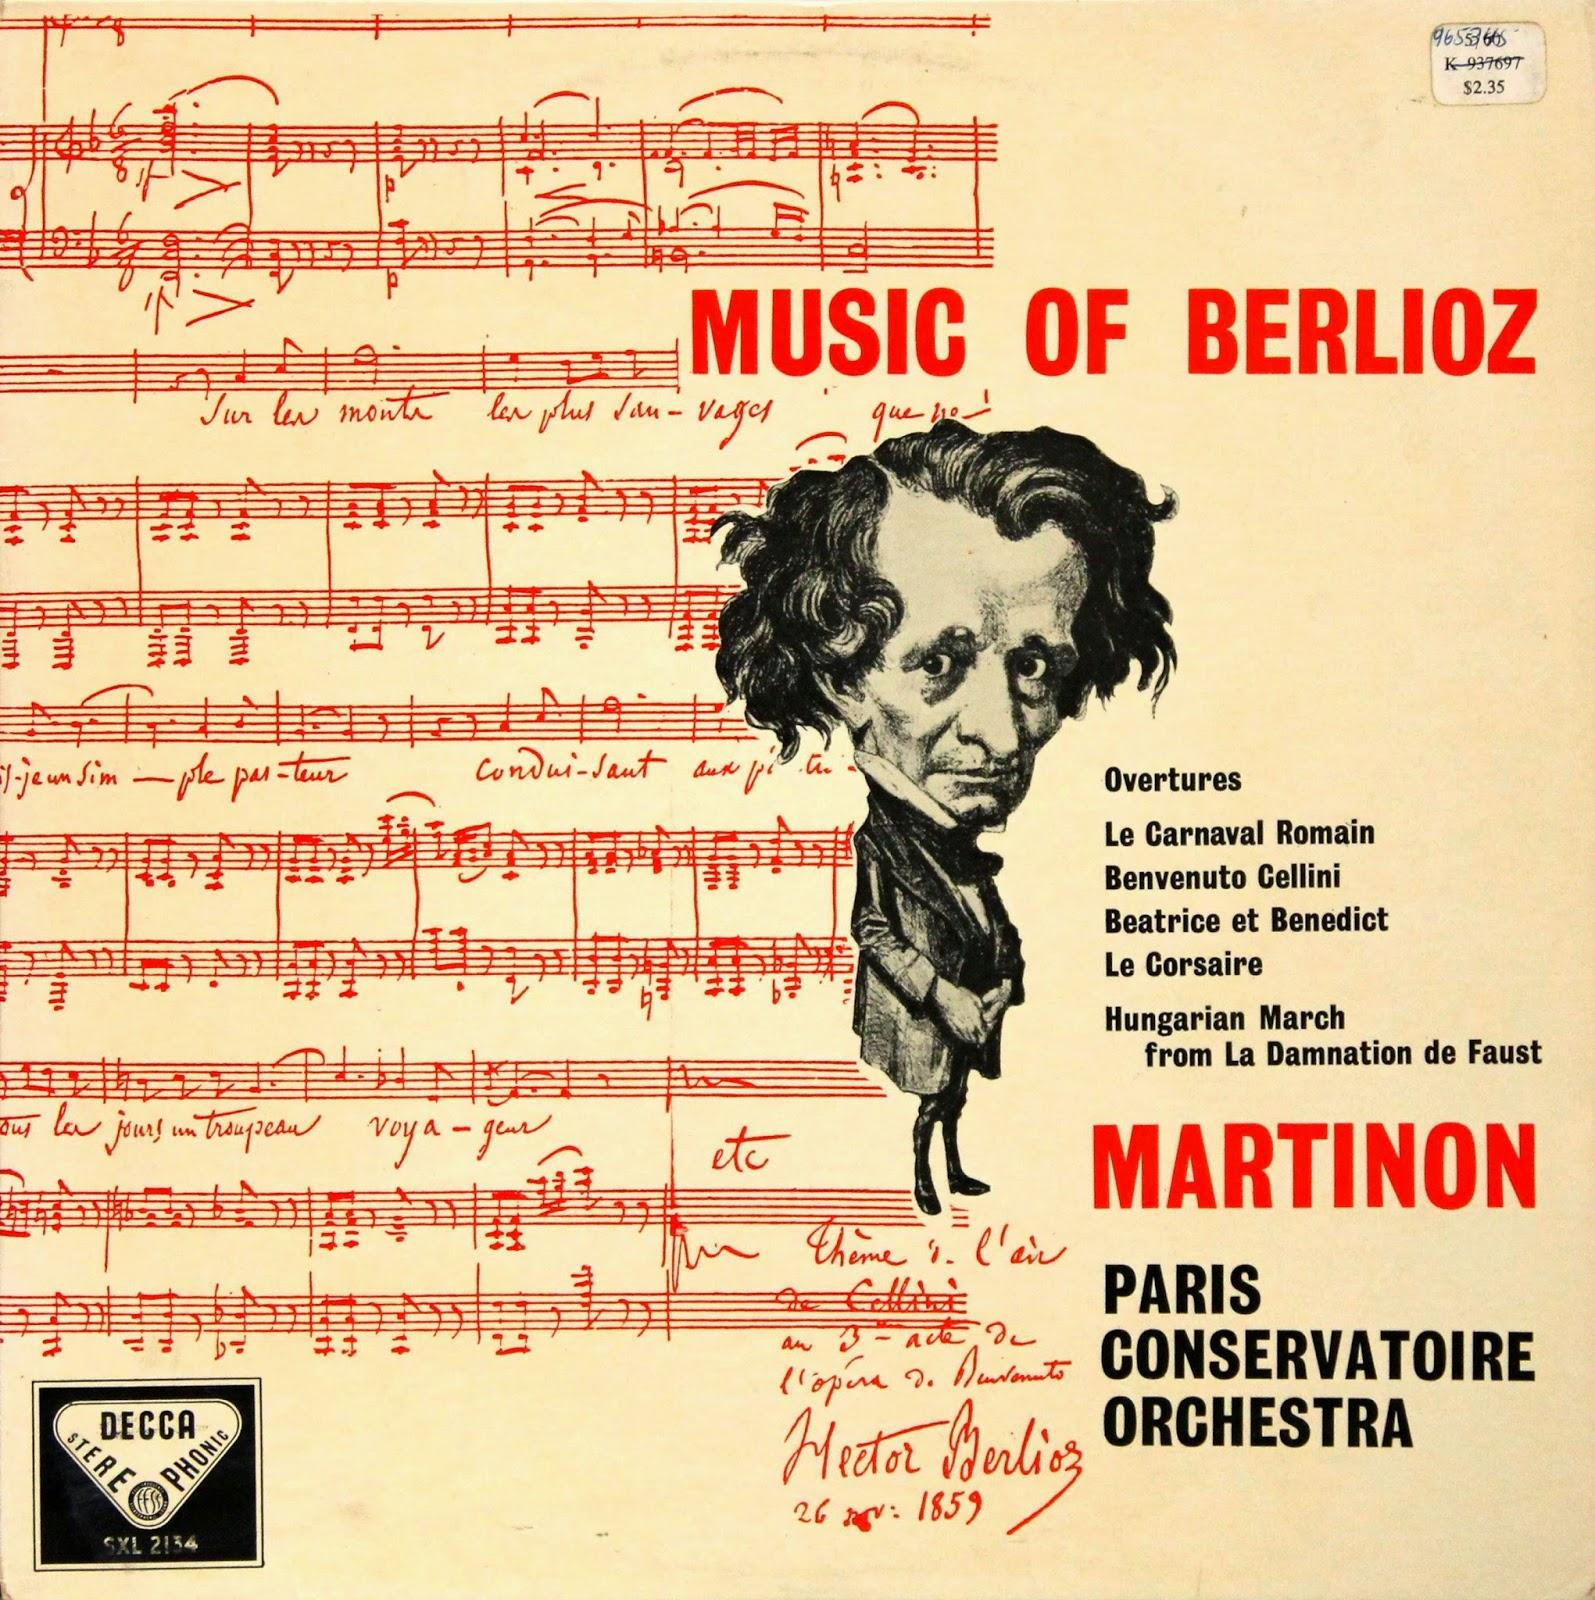 Decca SXL 2134: Music of Berlioz